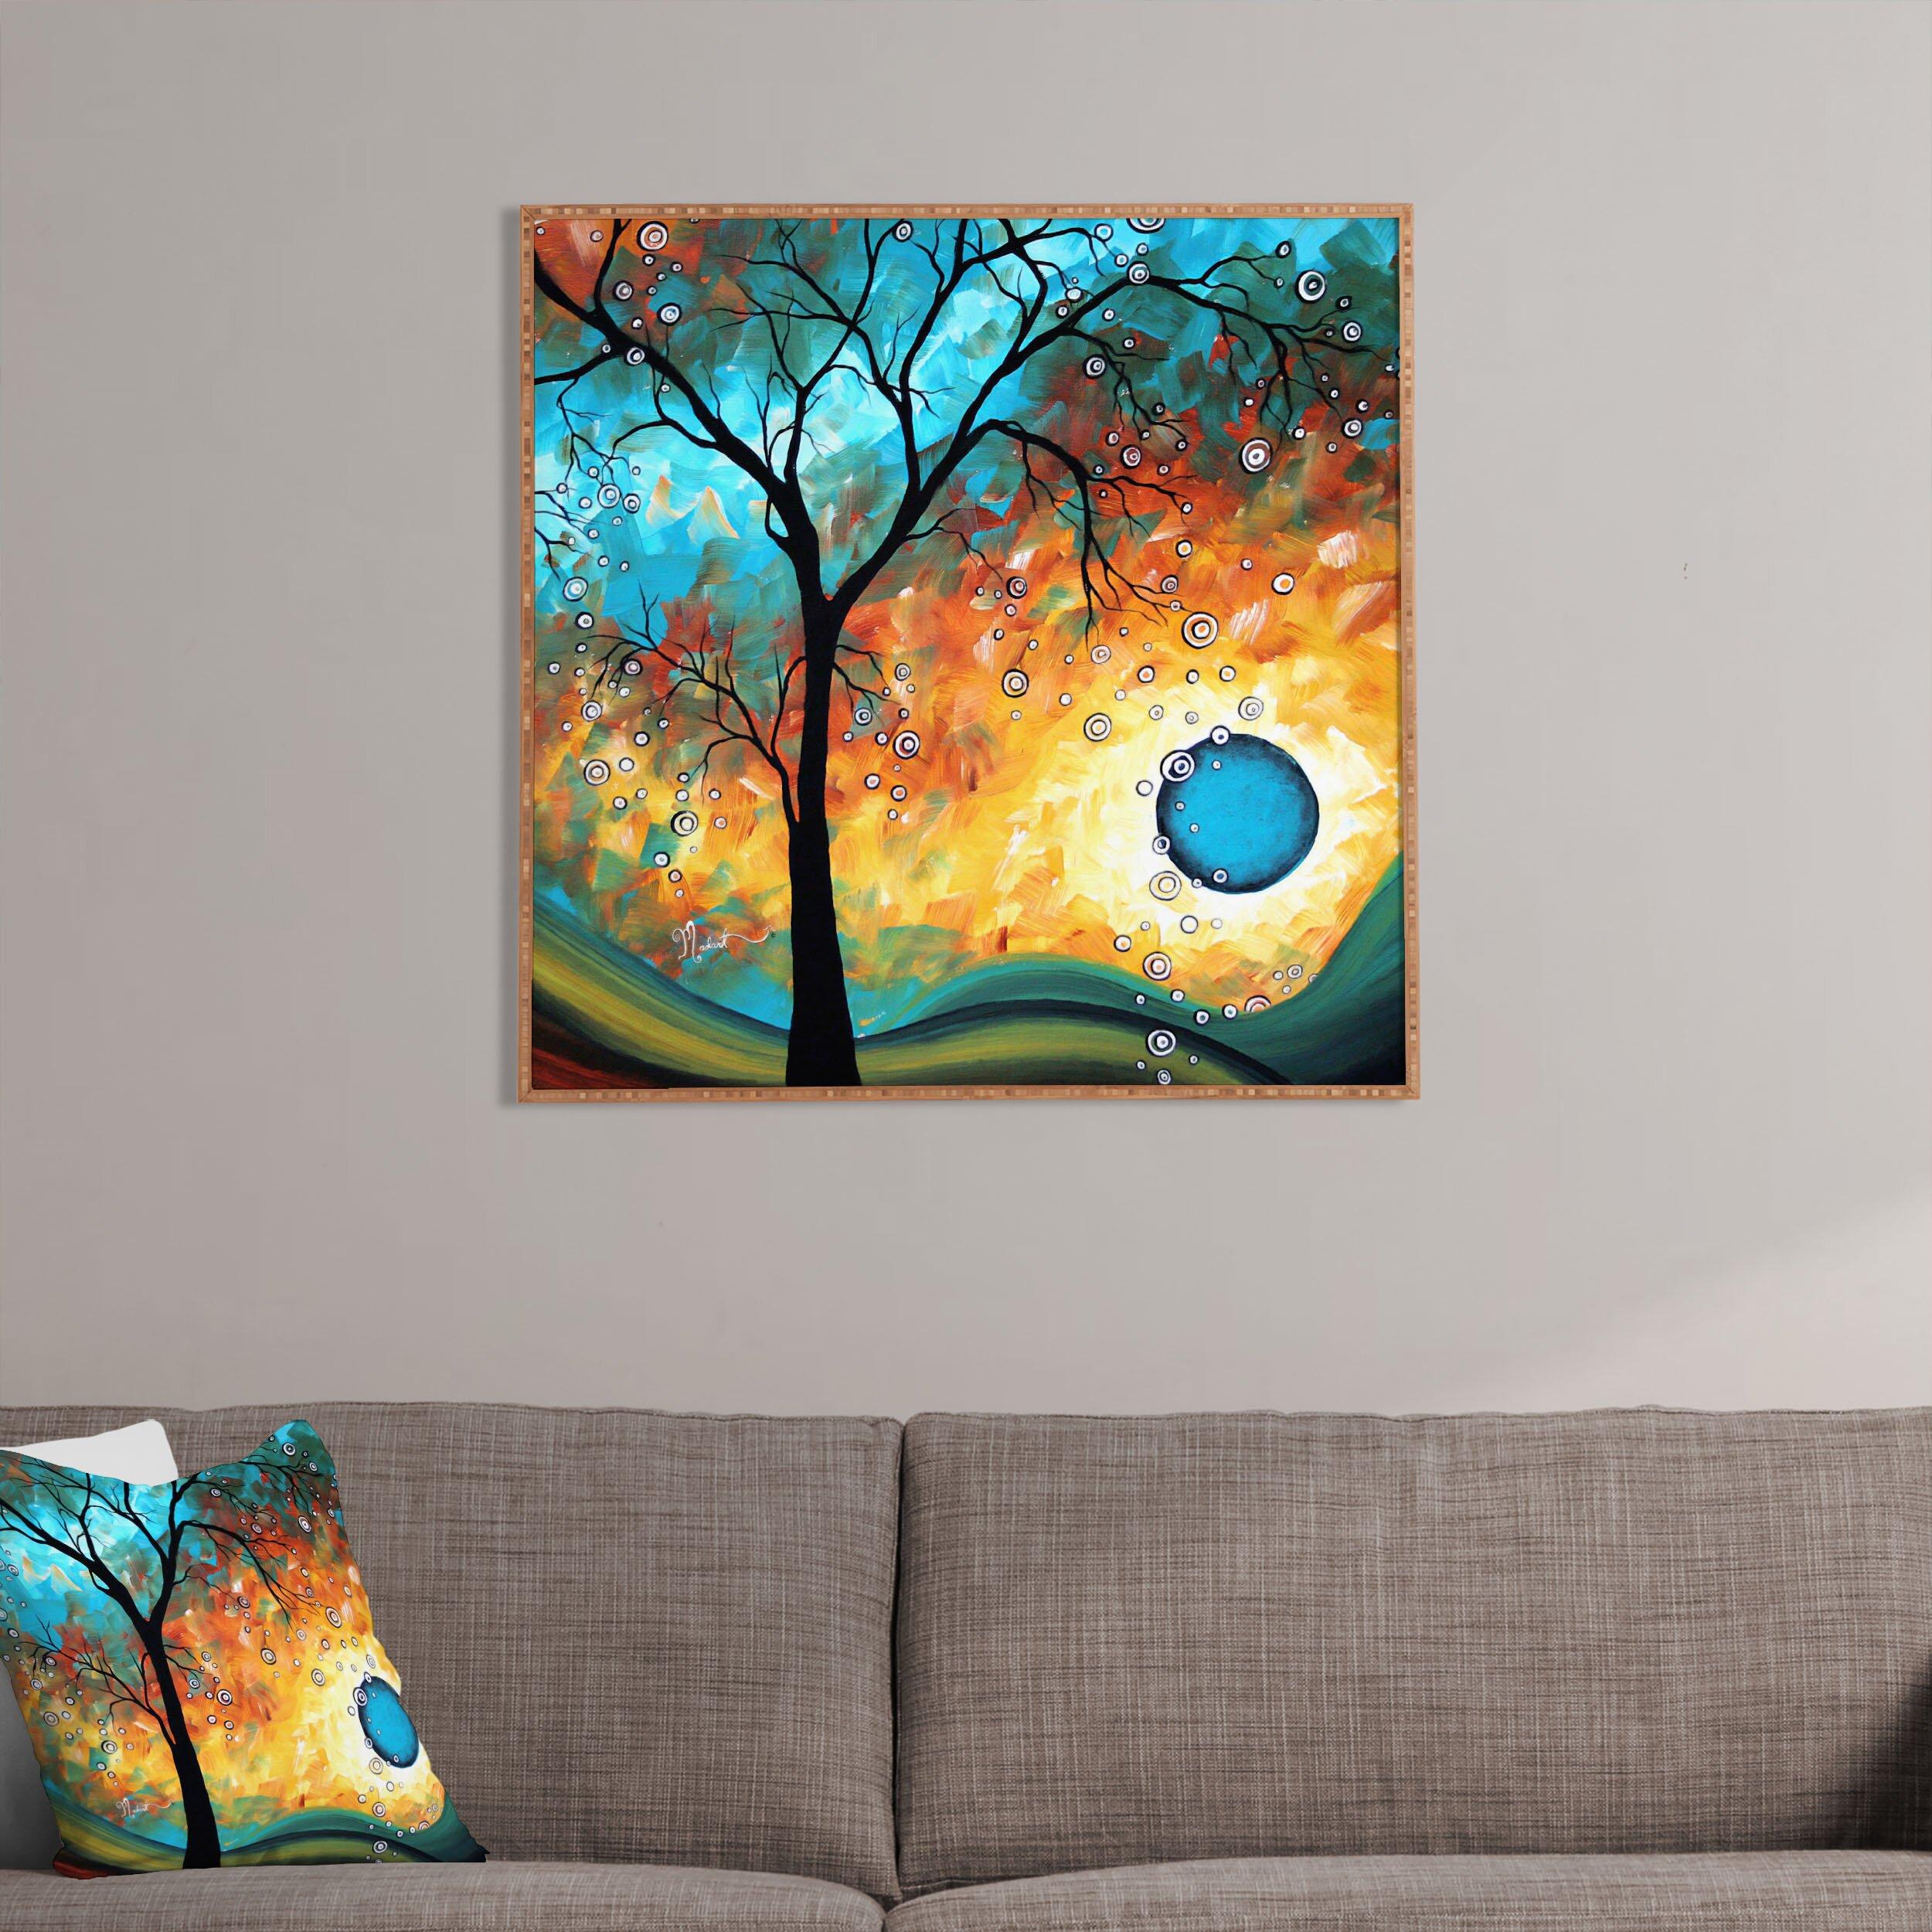 Artistic Wall Design Inc : Deny designs aqua burn by madart inc framed graphic art